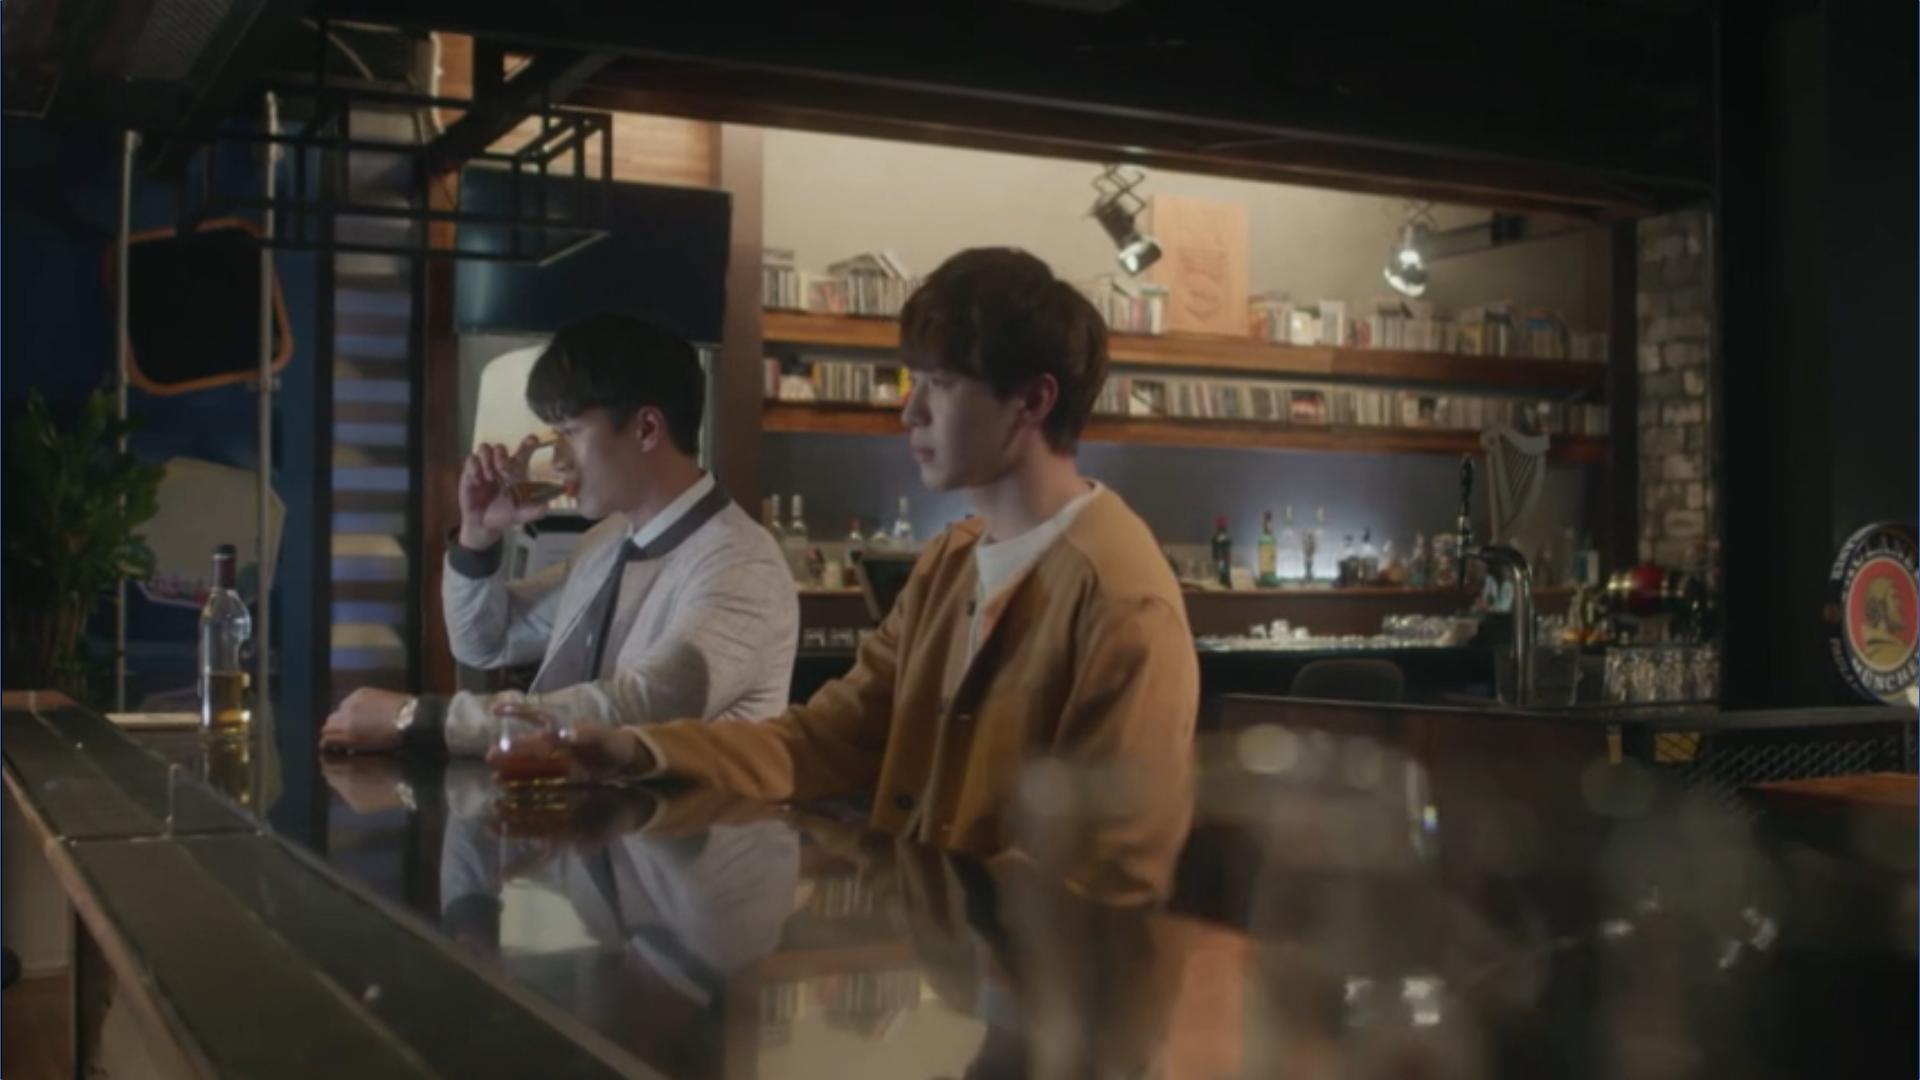 Wednesday 3:30 PM Yoon Jae-won and Baek Seung-gyu talking about Seon Eun-woo